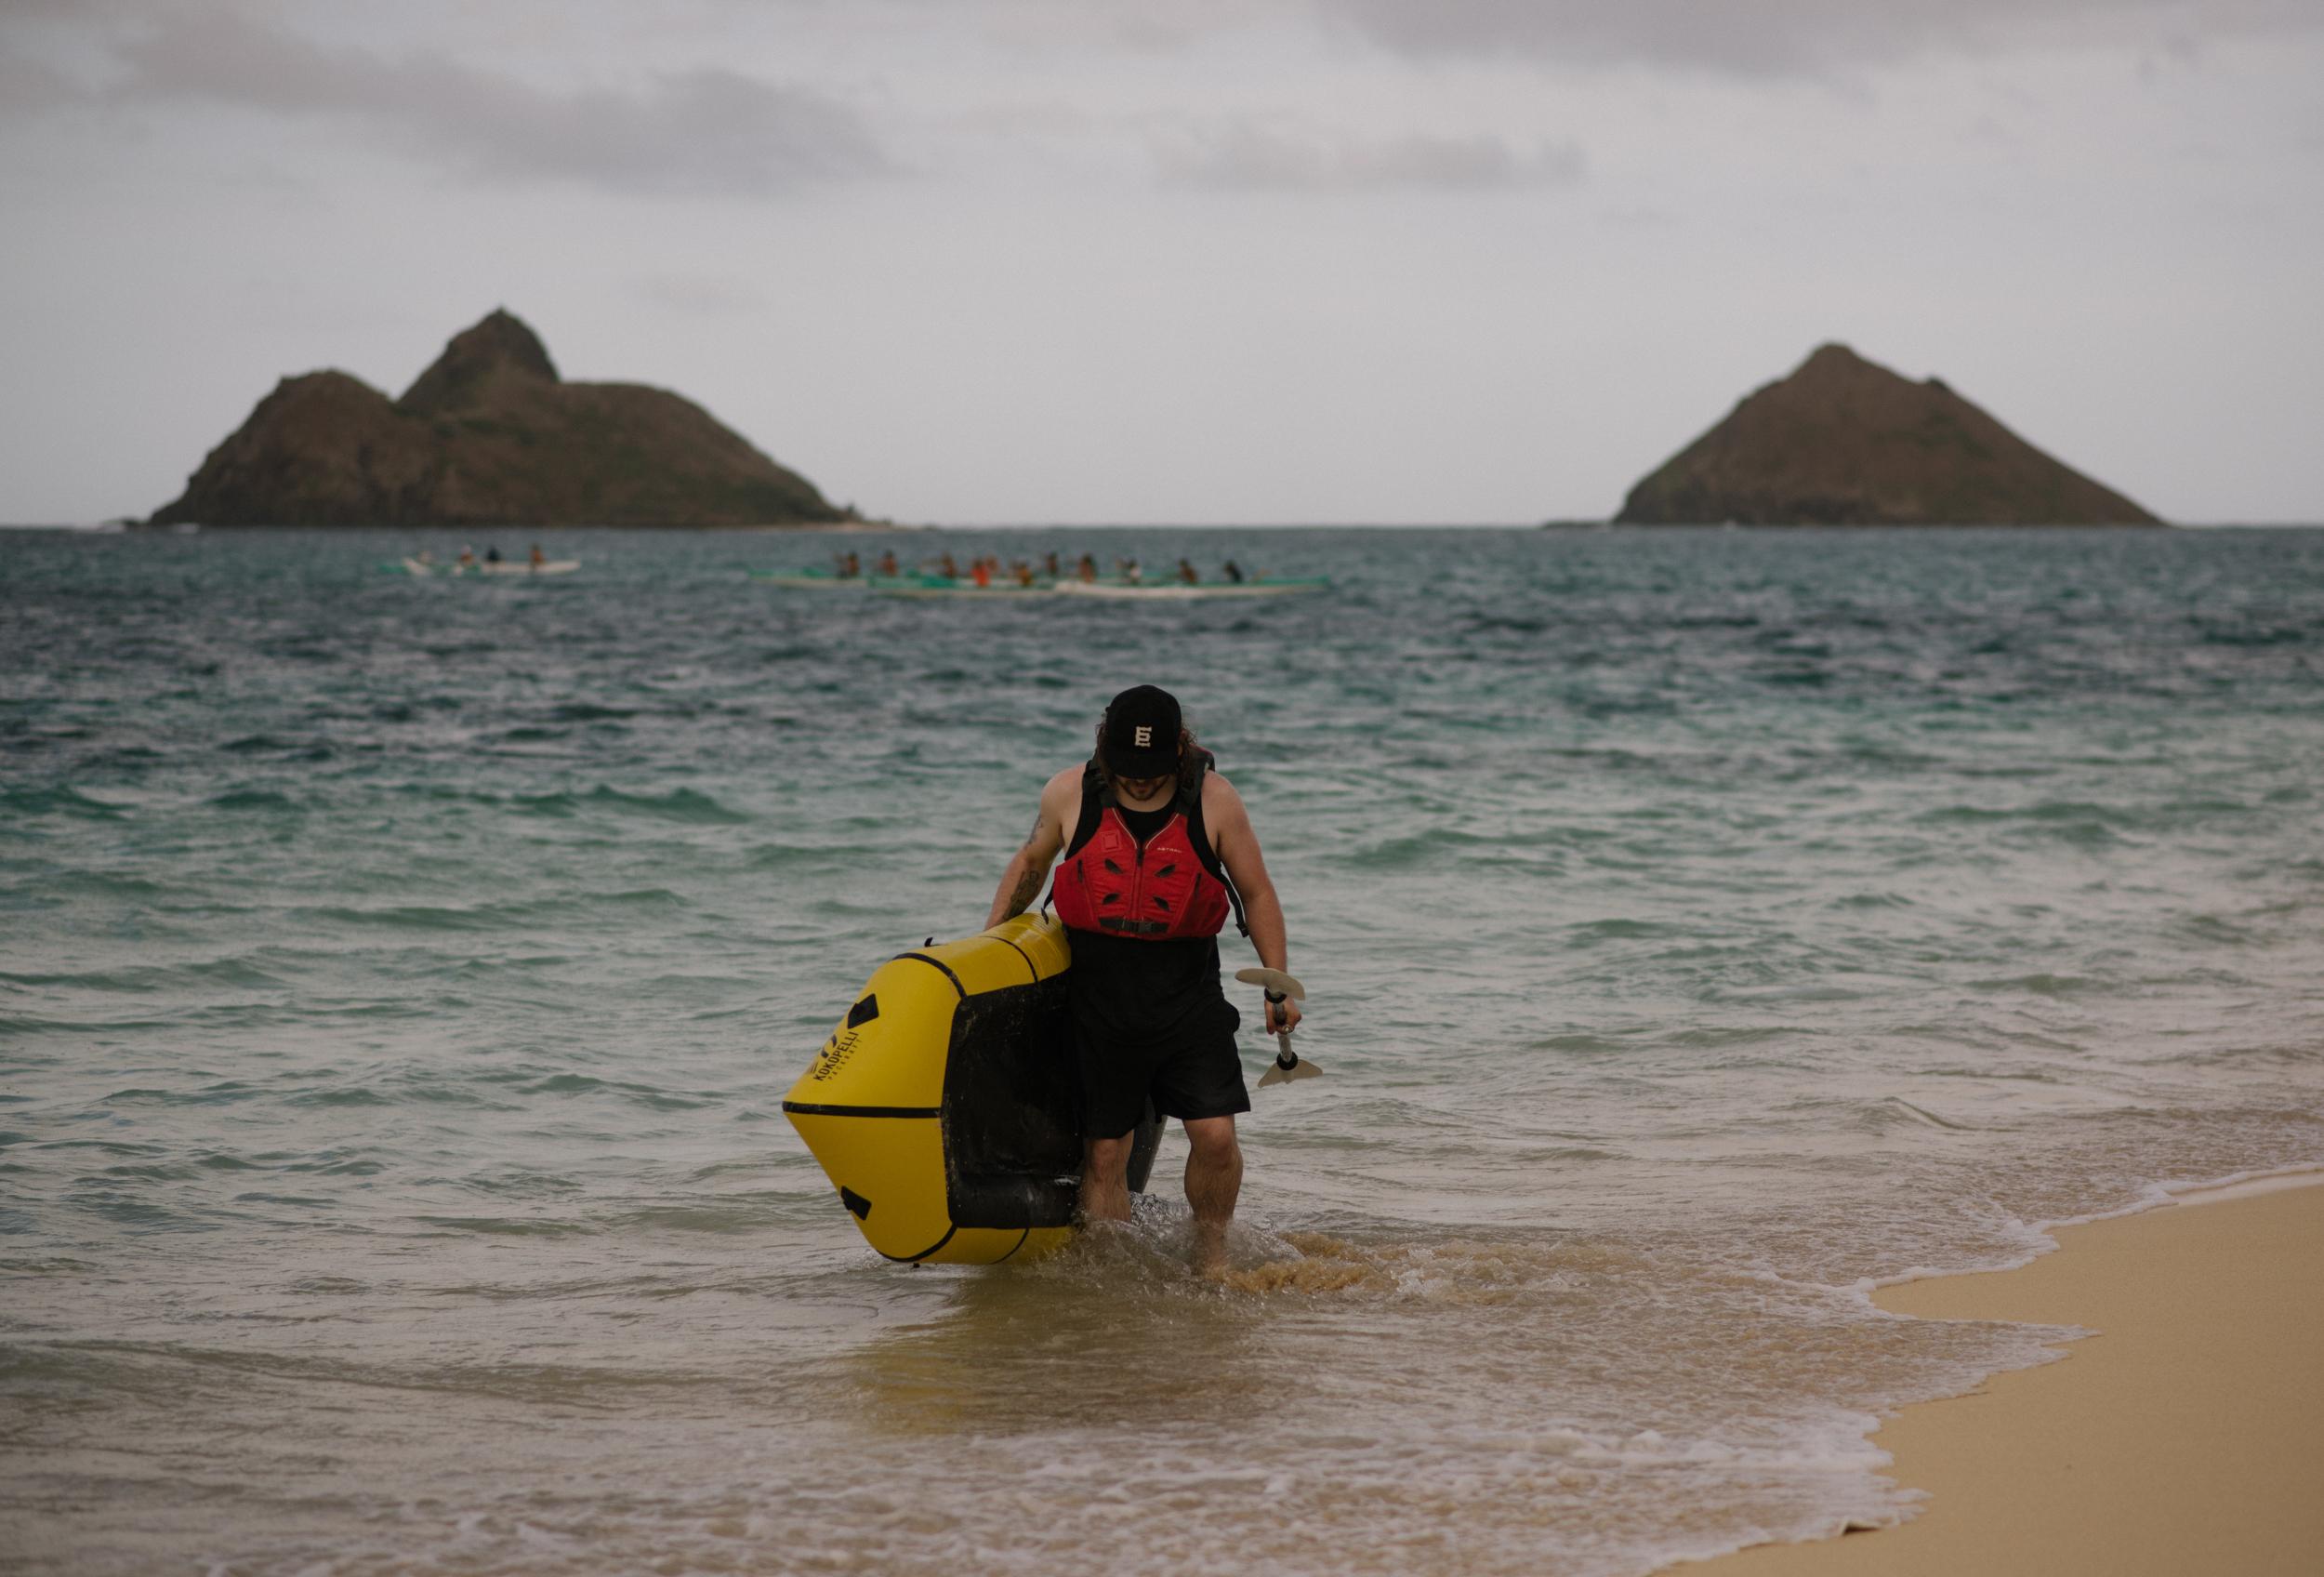 TannerWendellStewart_Brazil_Rogue_traveling_ocean_HighRes_1stPartyPrintDigital-89814.jpg